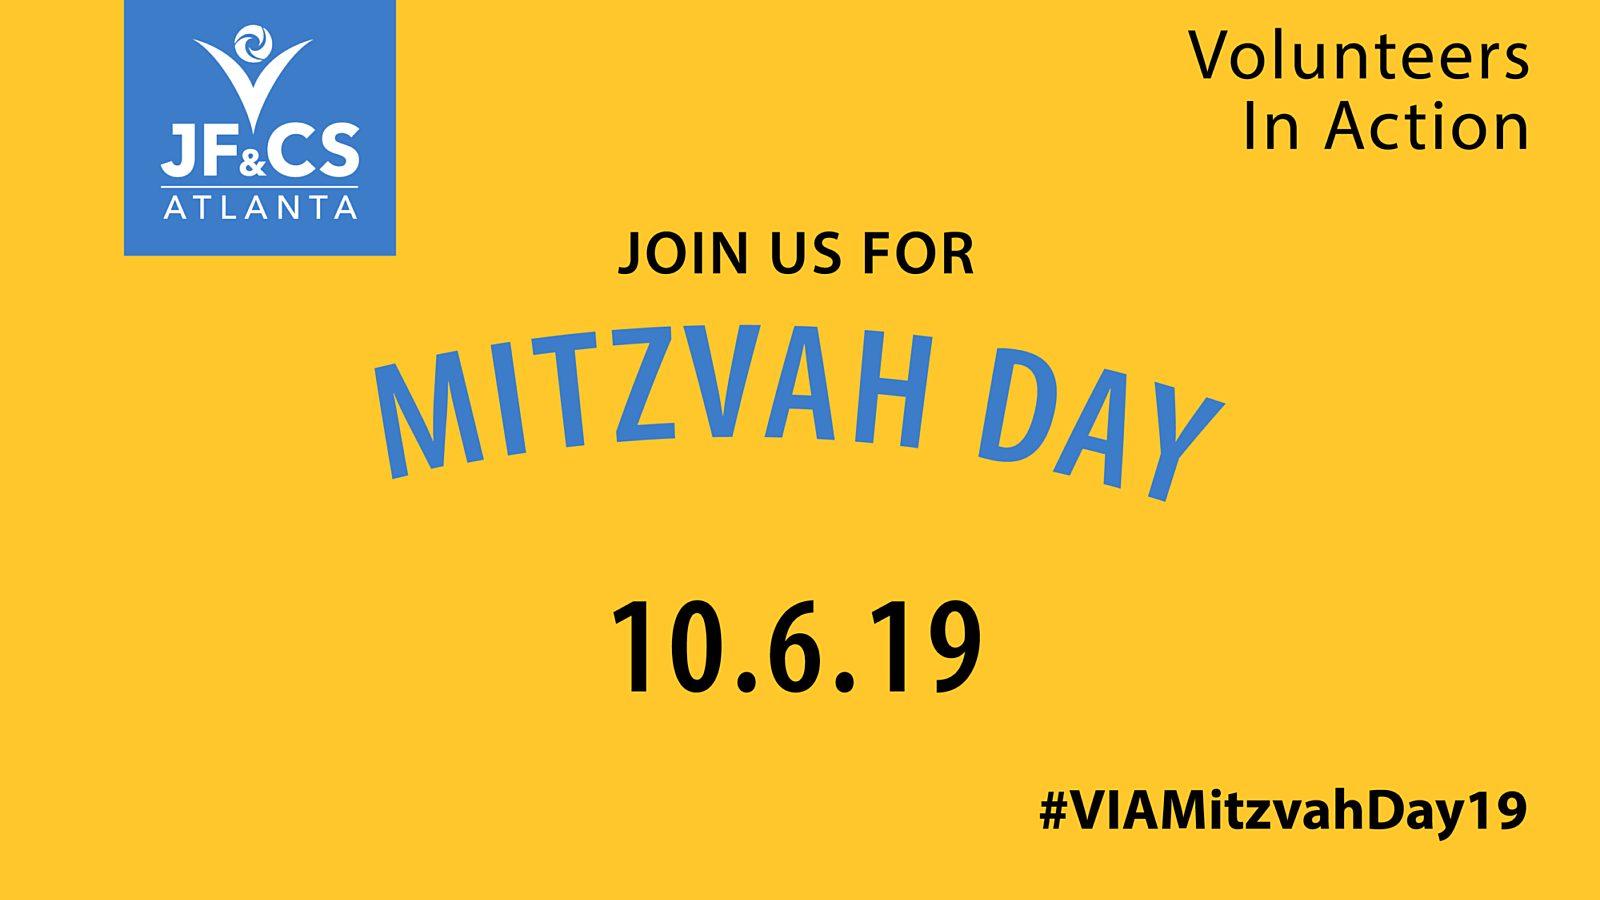 Mitzvah Day 2019